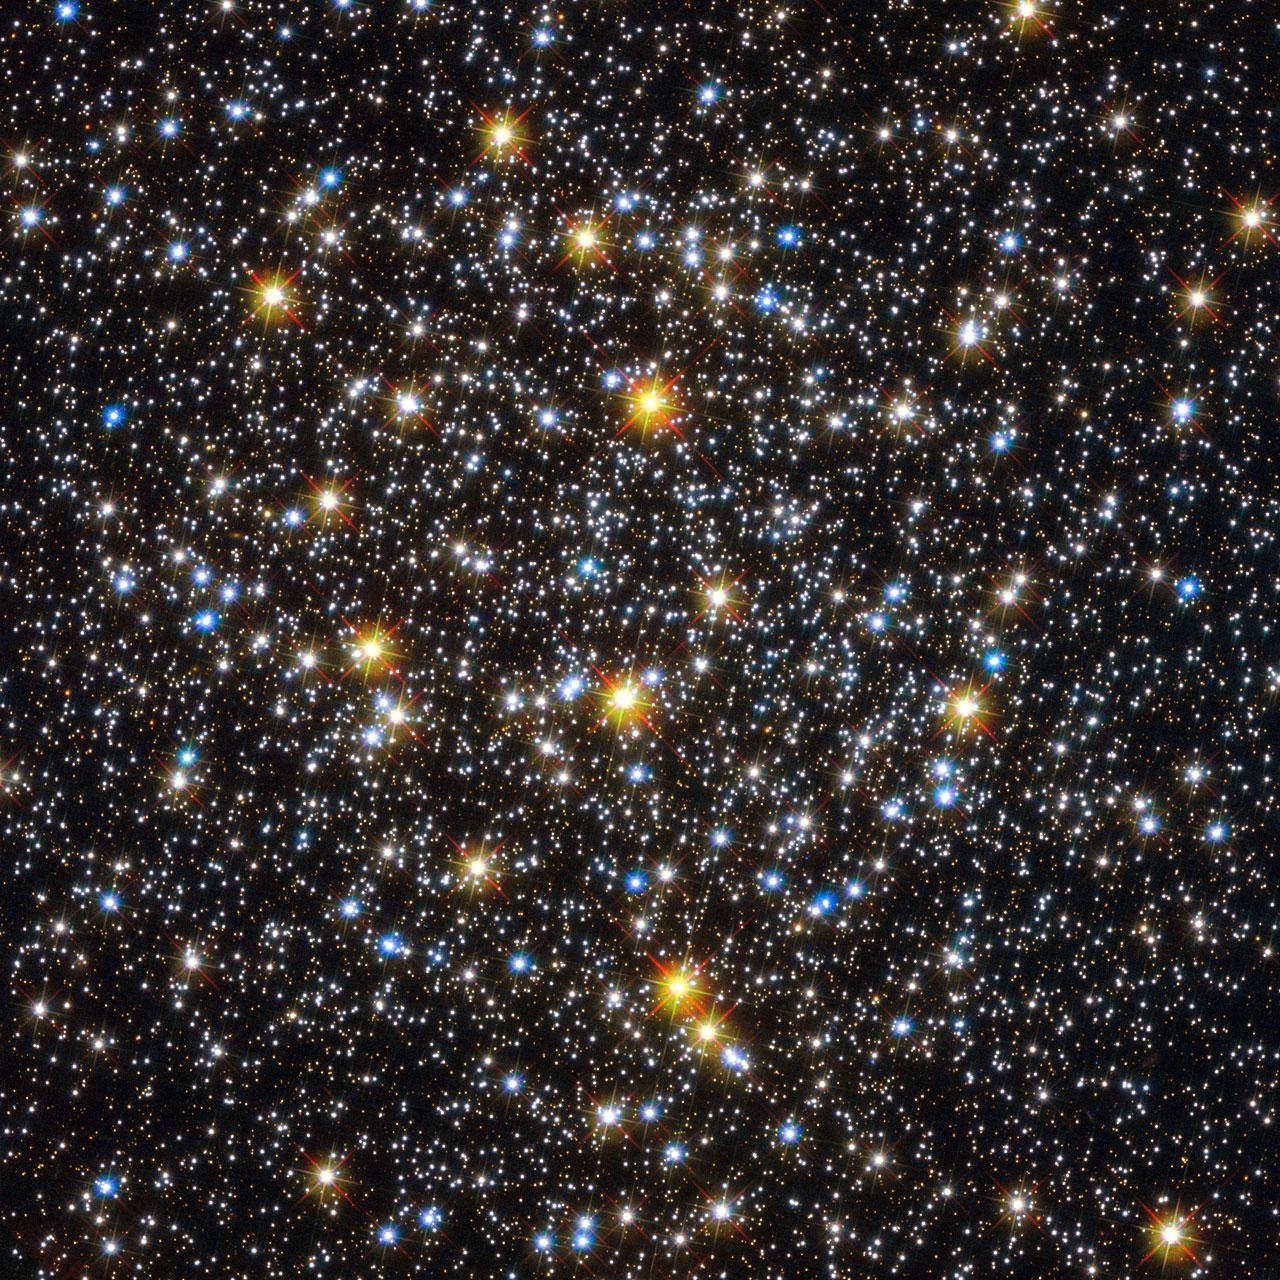 nasa interstellar nov 11 - photo #27